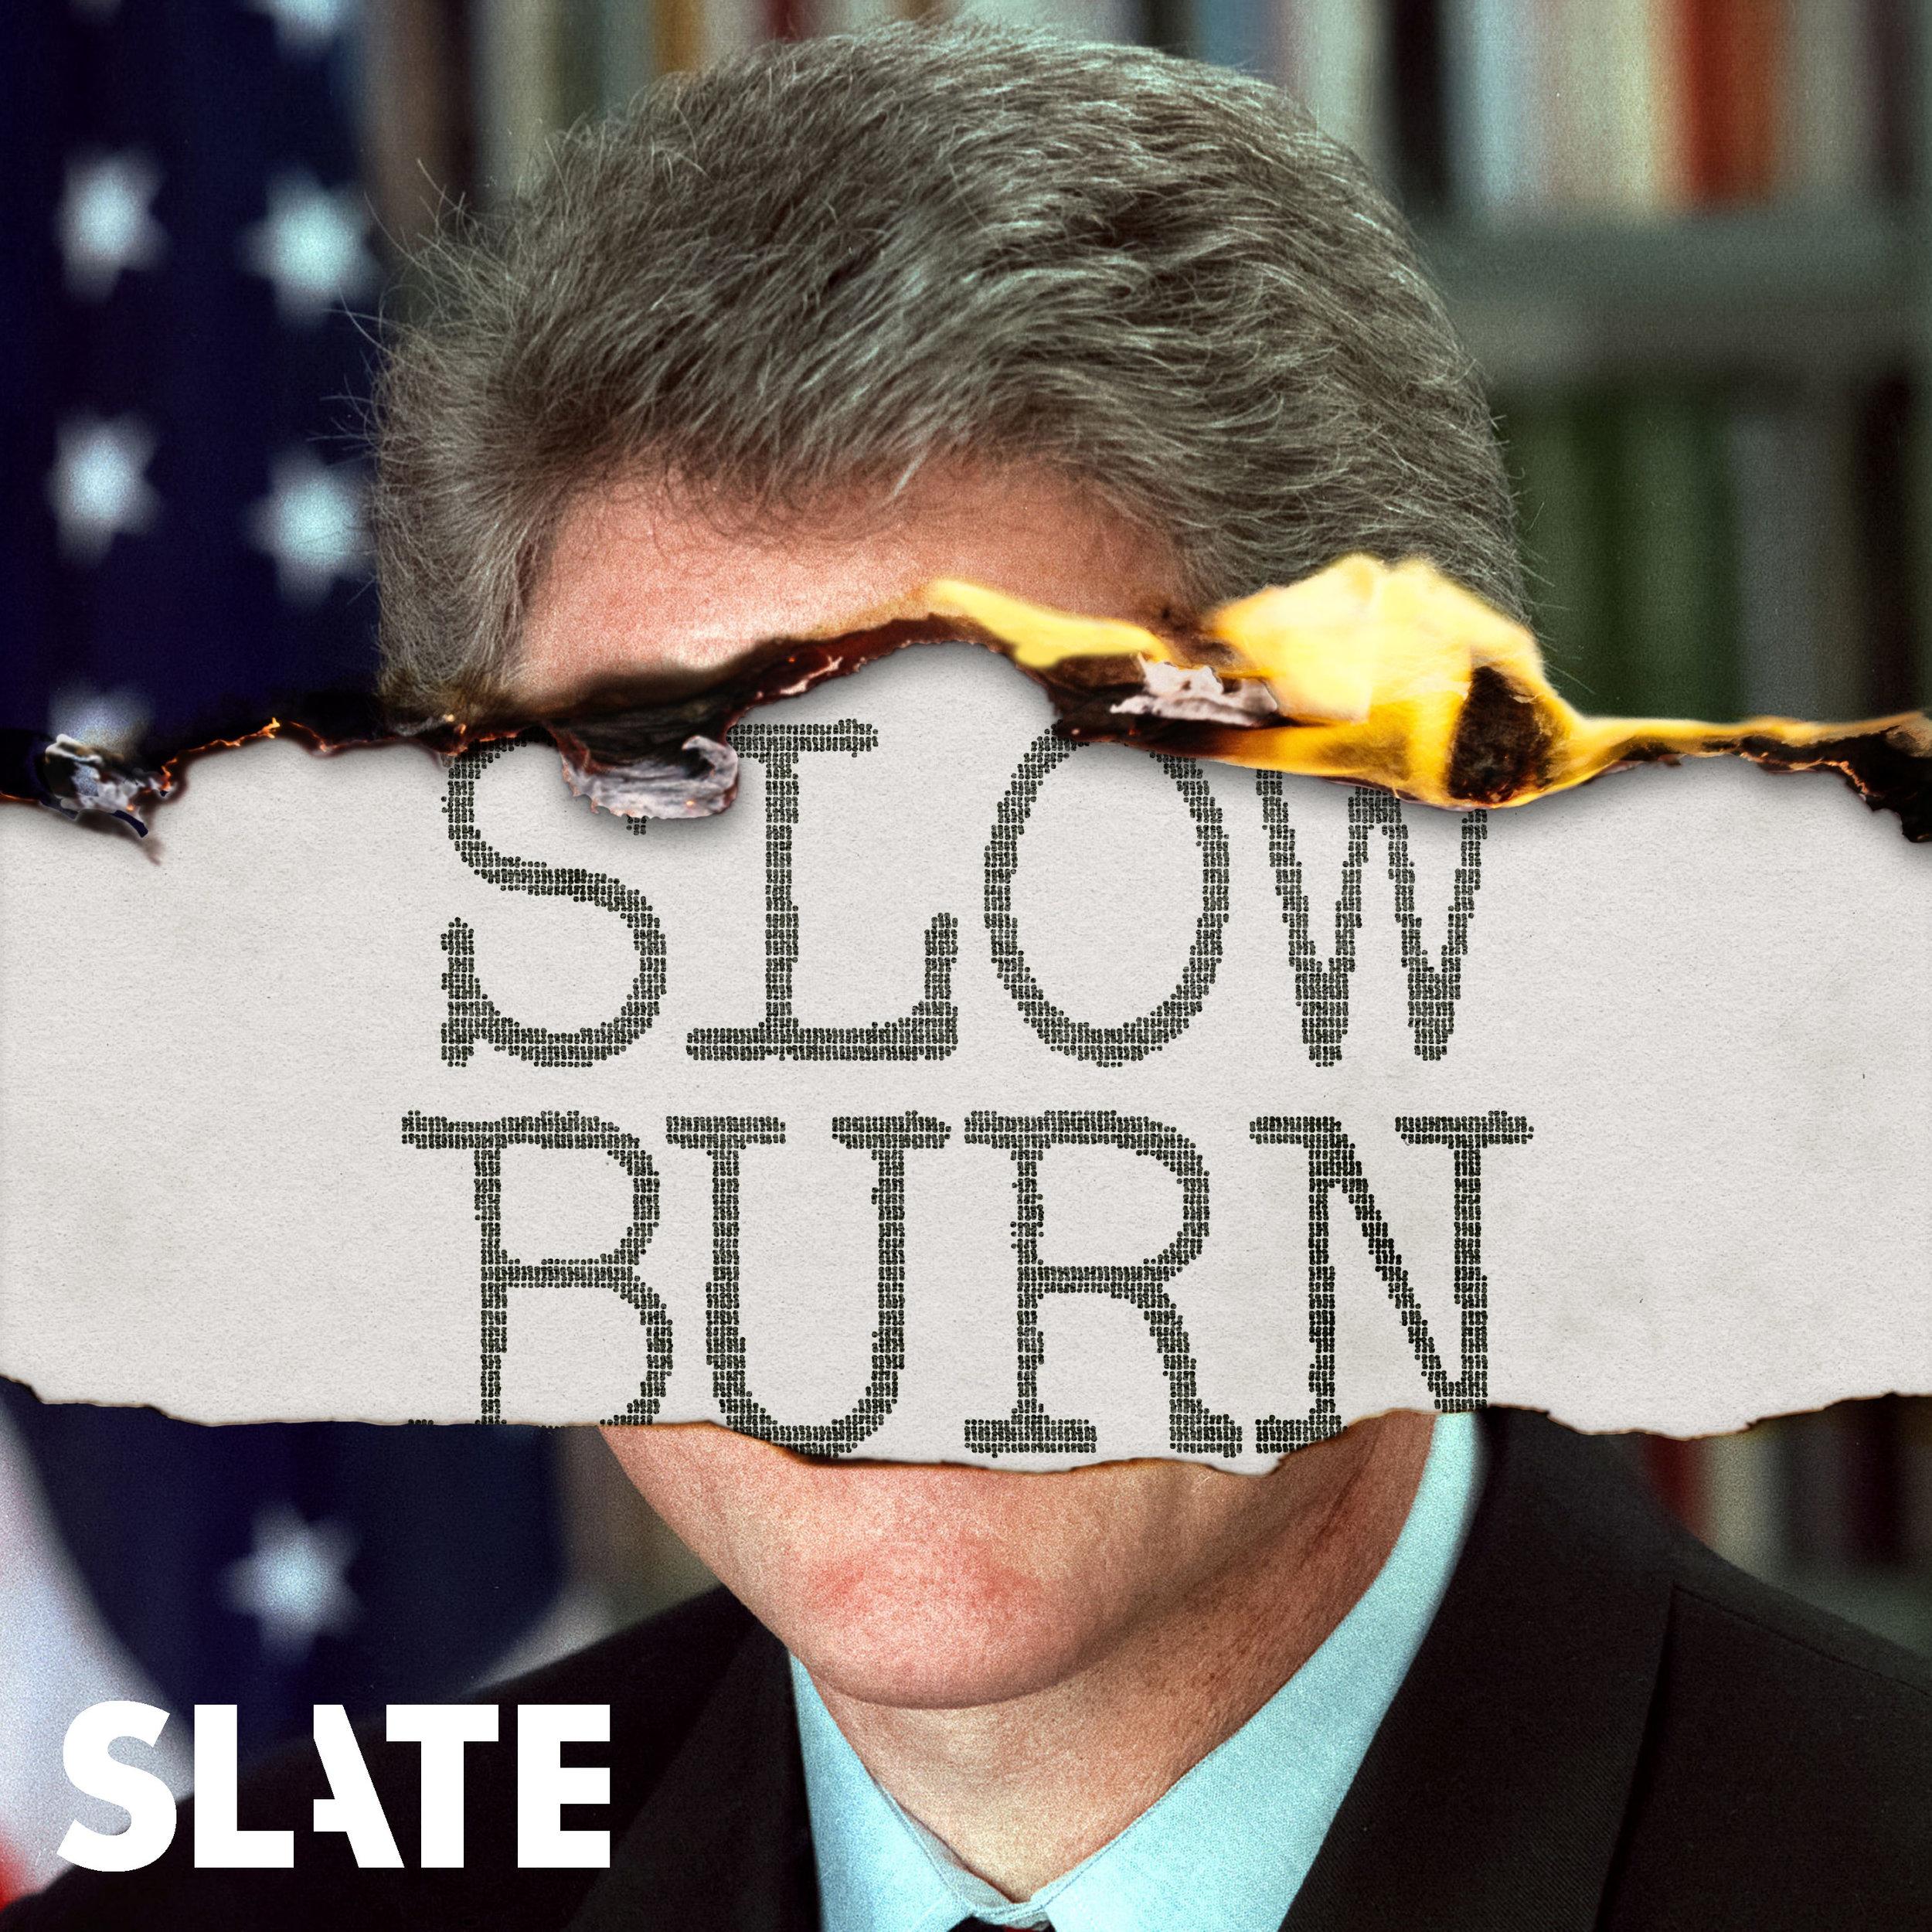 16. Slow Burn - Slate